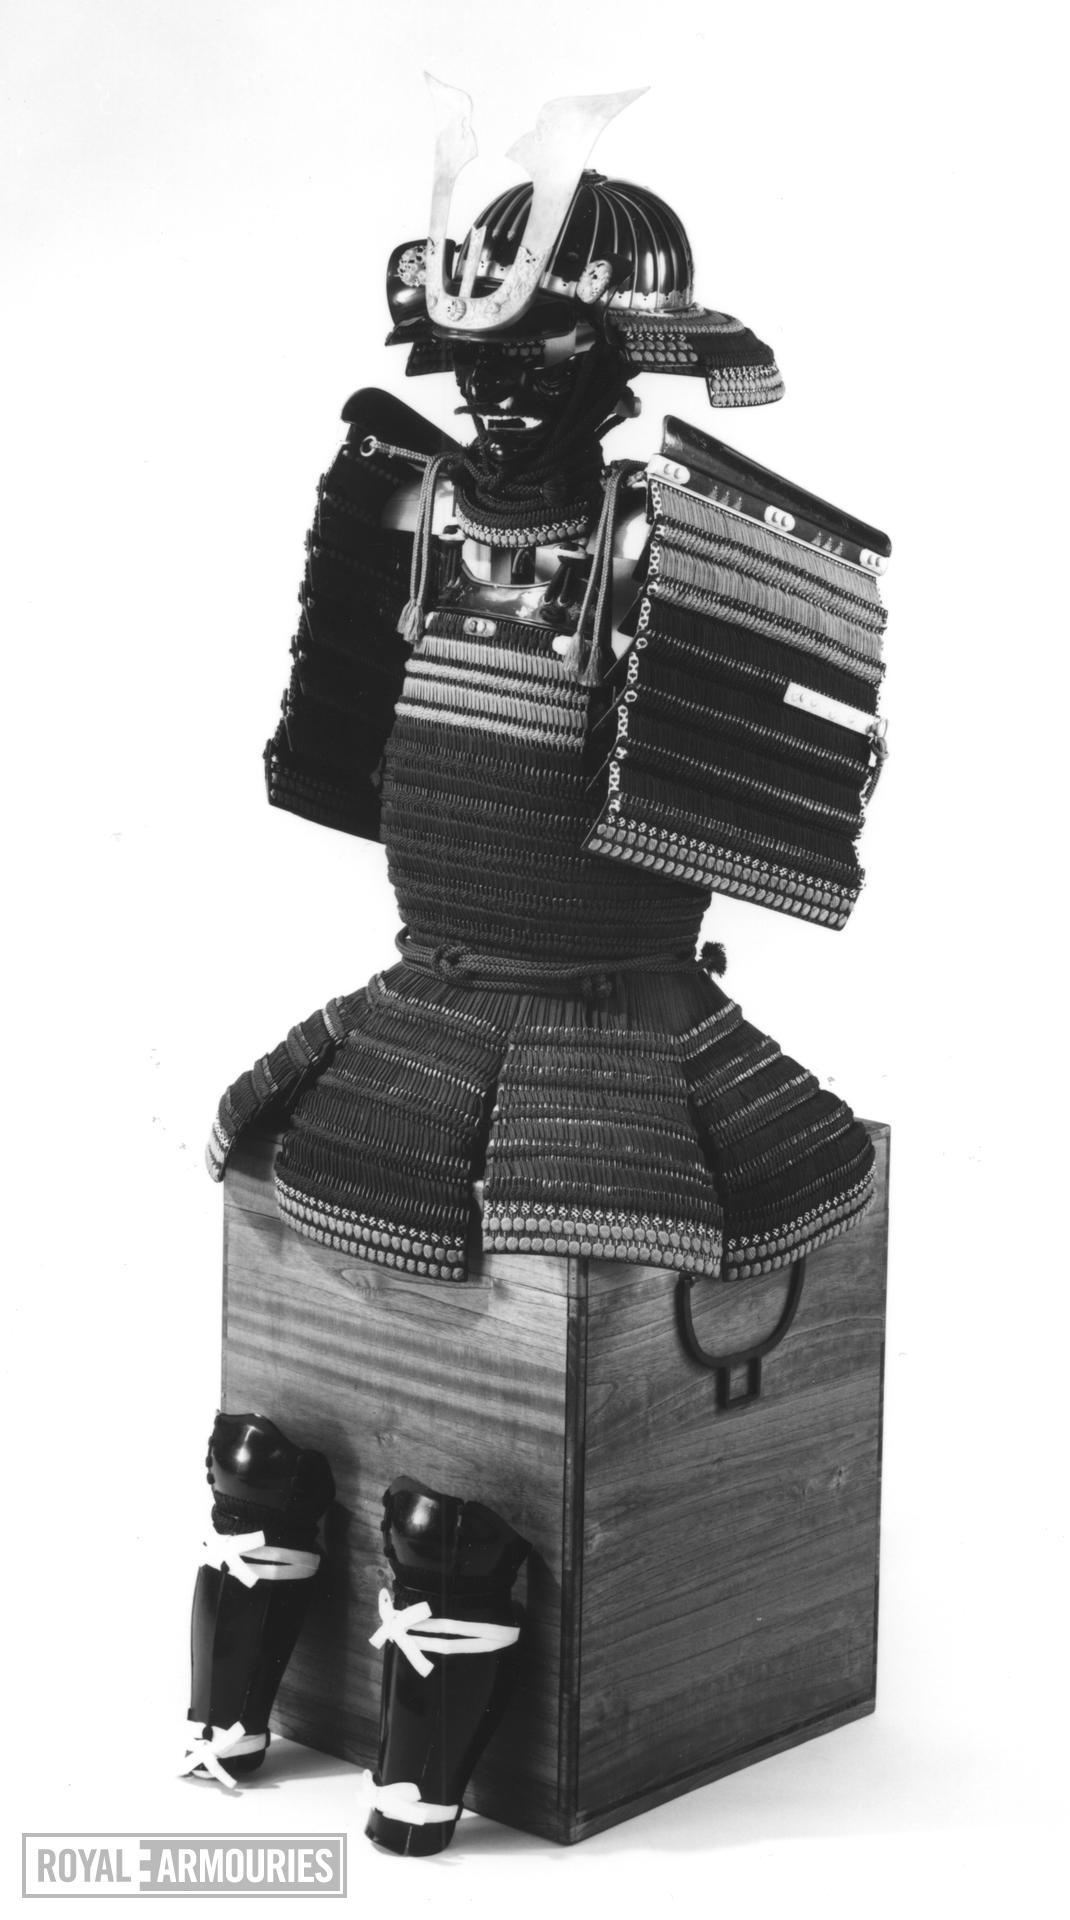 Armour (domaru) - Domaru Presented to King James I by Tokugawa Hidetada, by Iwai Yozaemon, possibly for Takeda Katsuyori originally and modified for presentation about 1610.